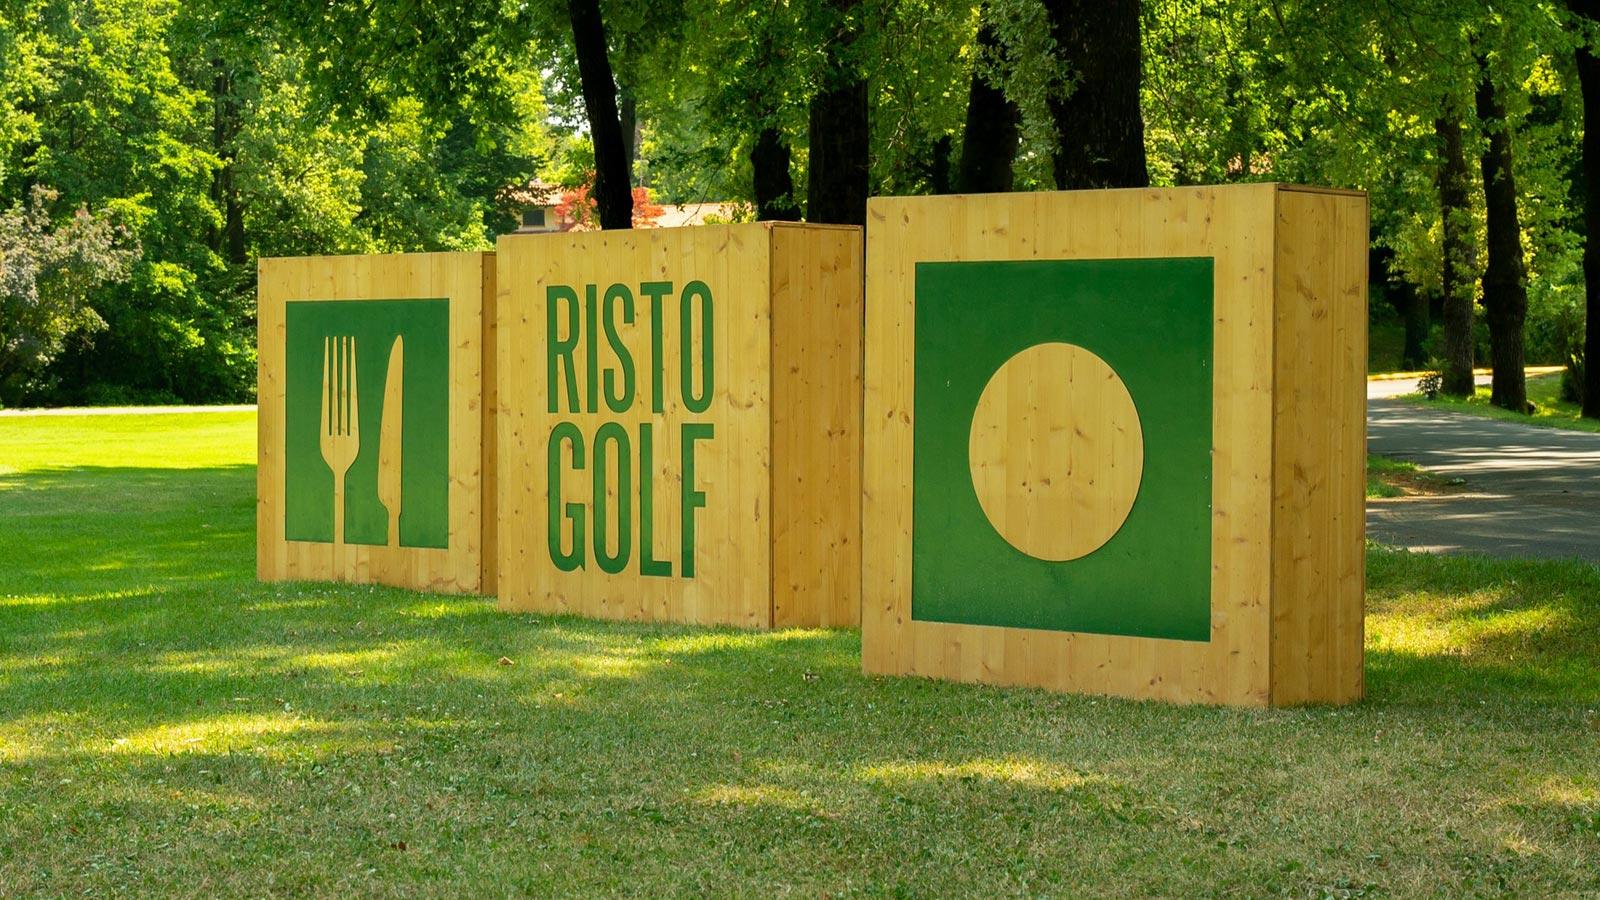 Ristogolf 2020, Signature Kitchen Suite come partner sponsor